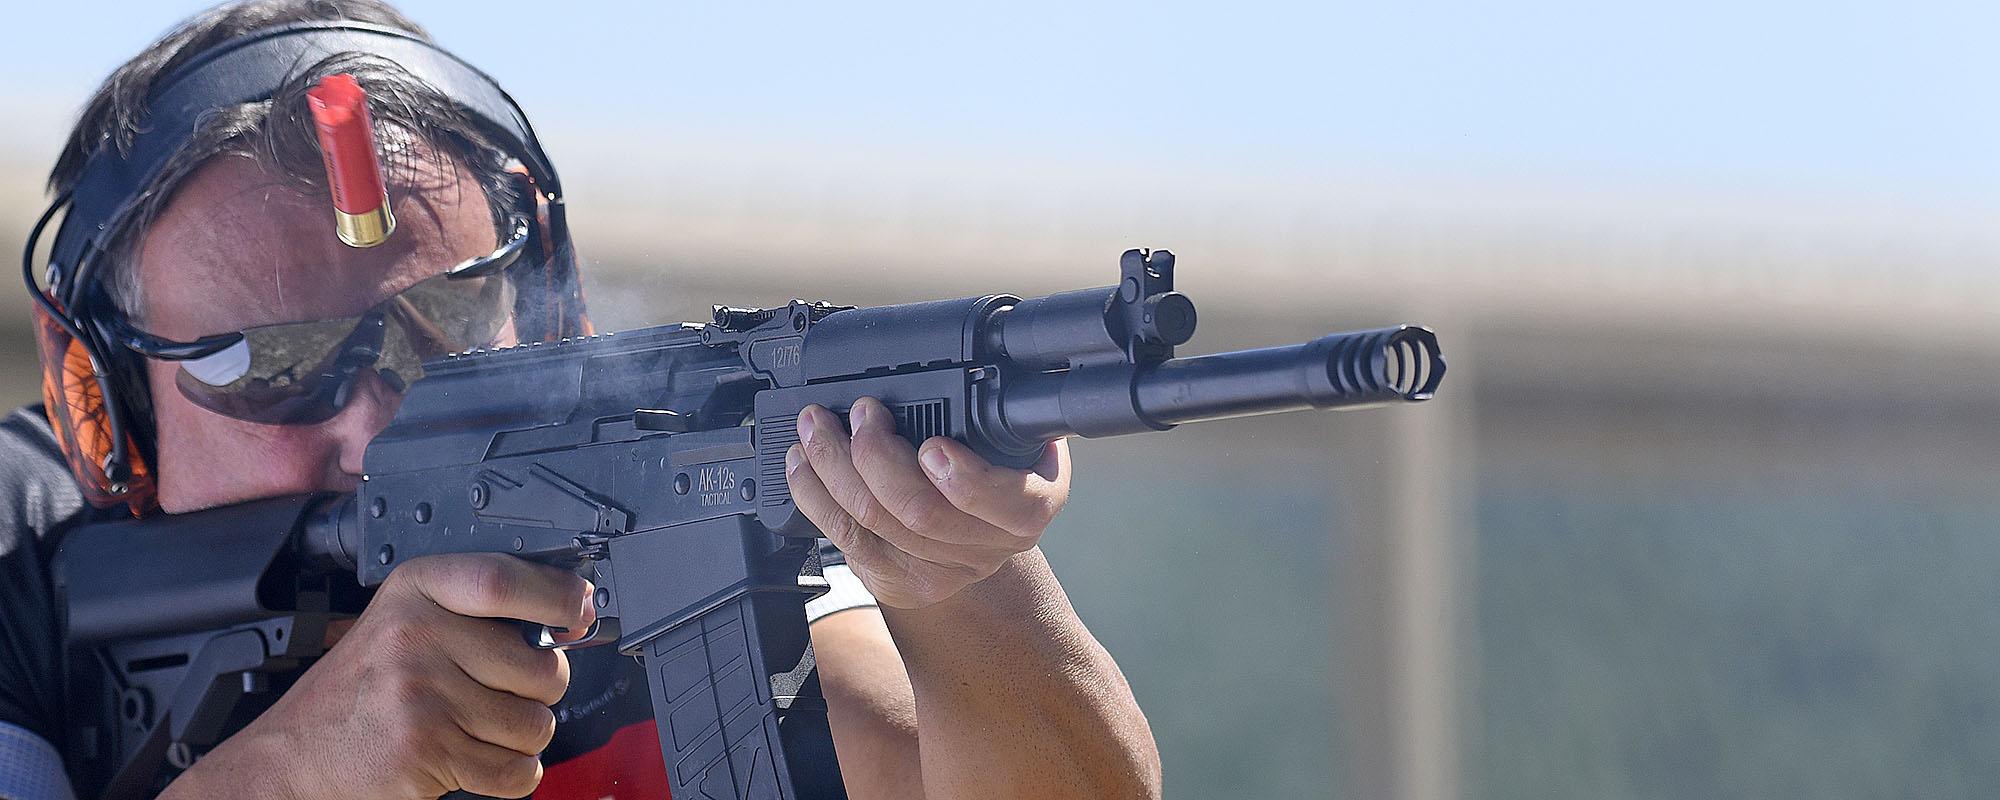 VIDEO (promo): SDM AK-12s Tactical shotgun | GUNSweek.com